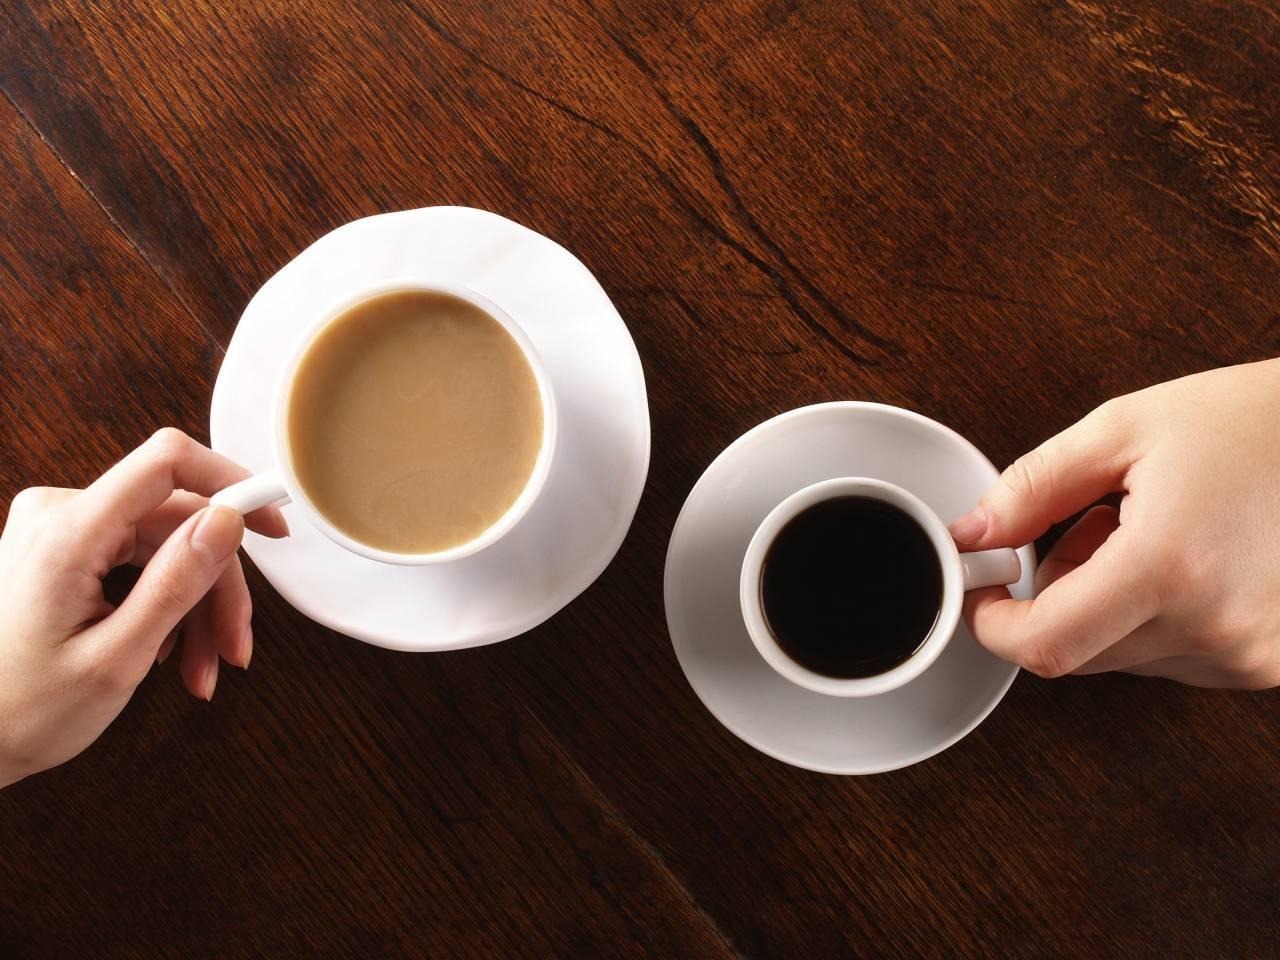 tea_and_coffe.jpg